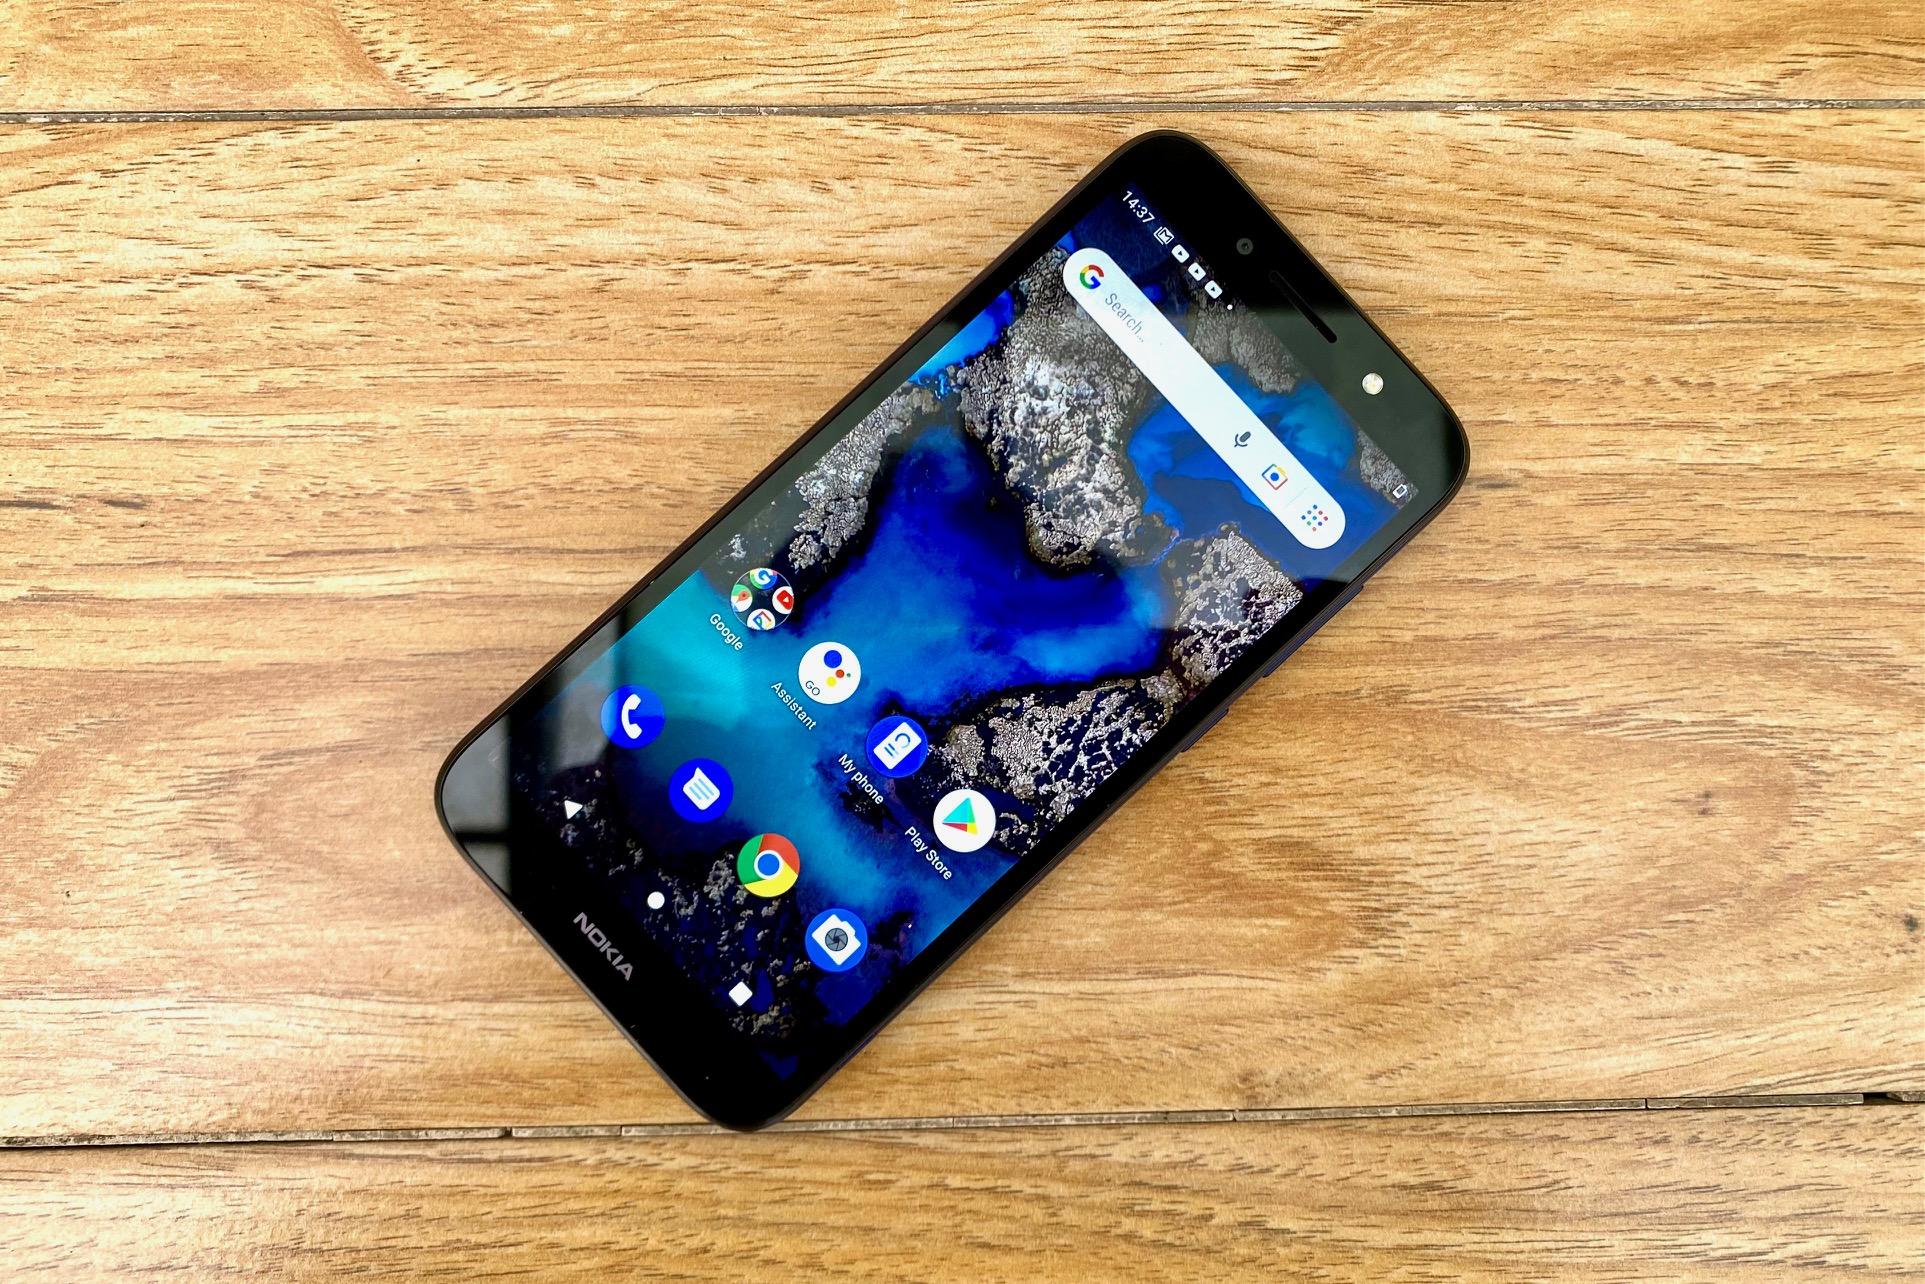 Nokia C1 Plus Review: Display